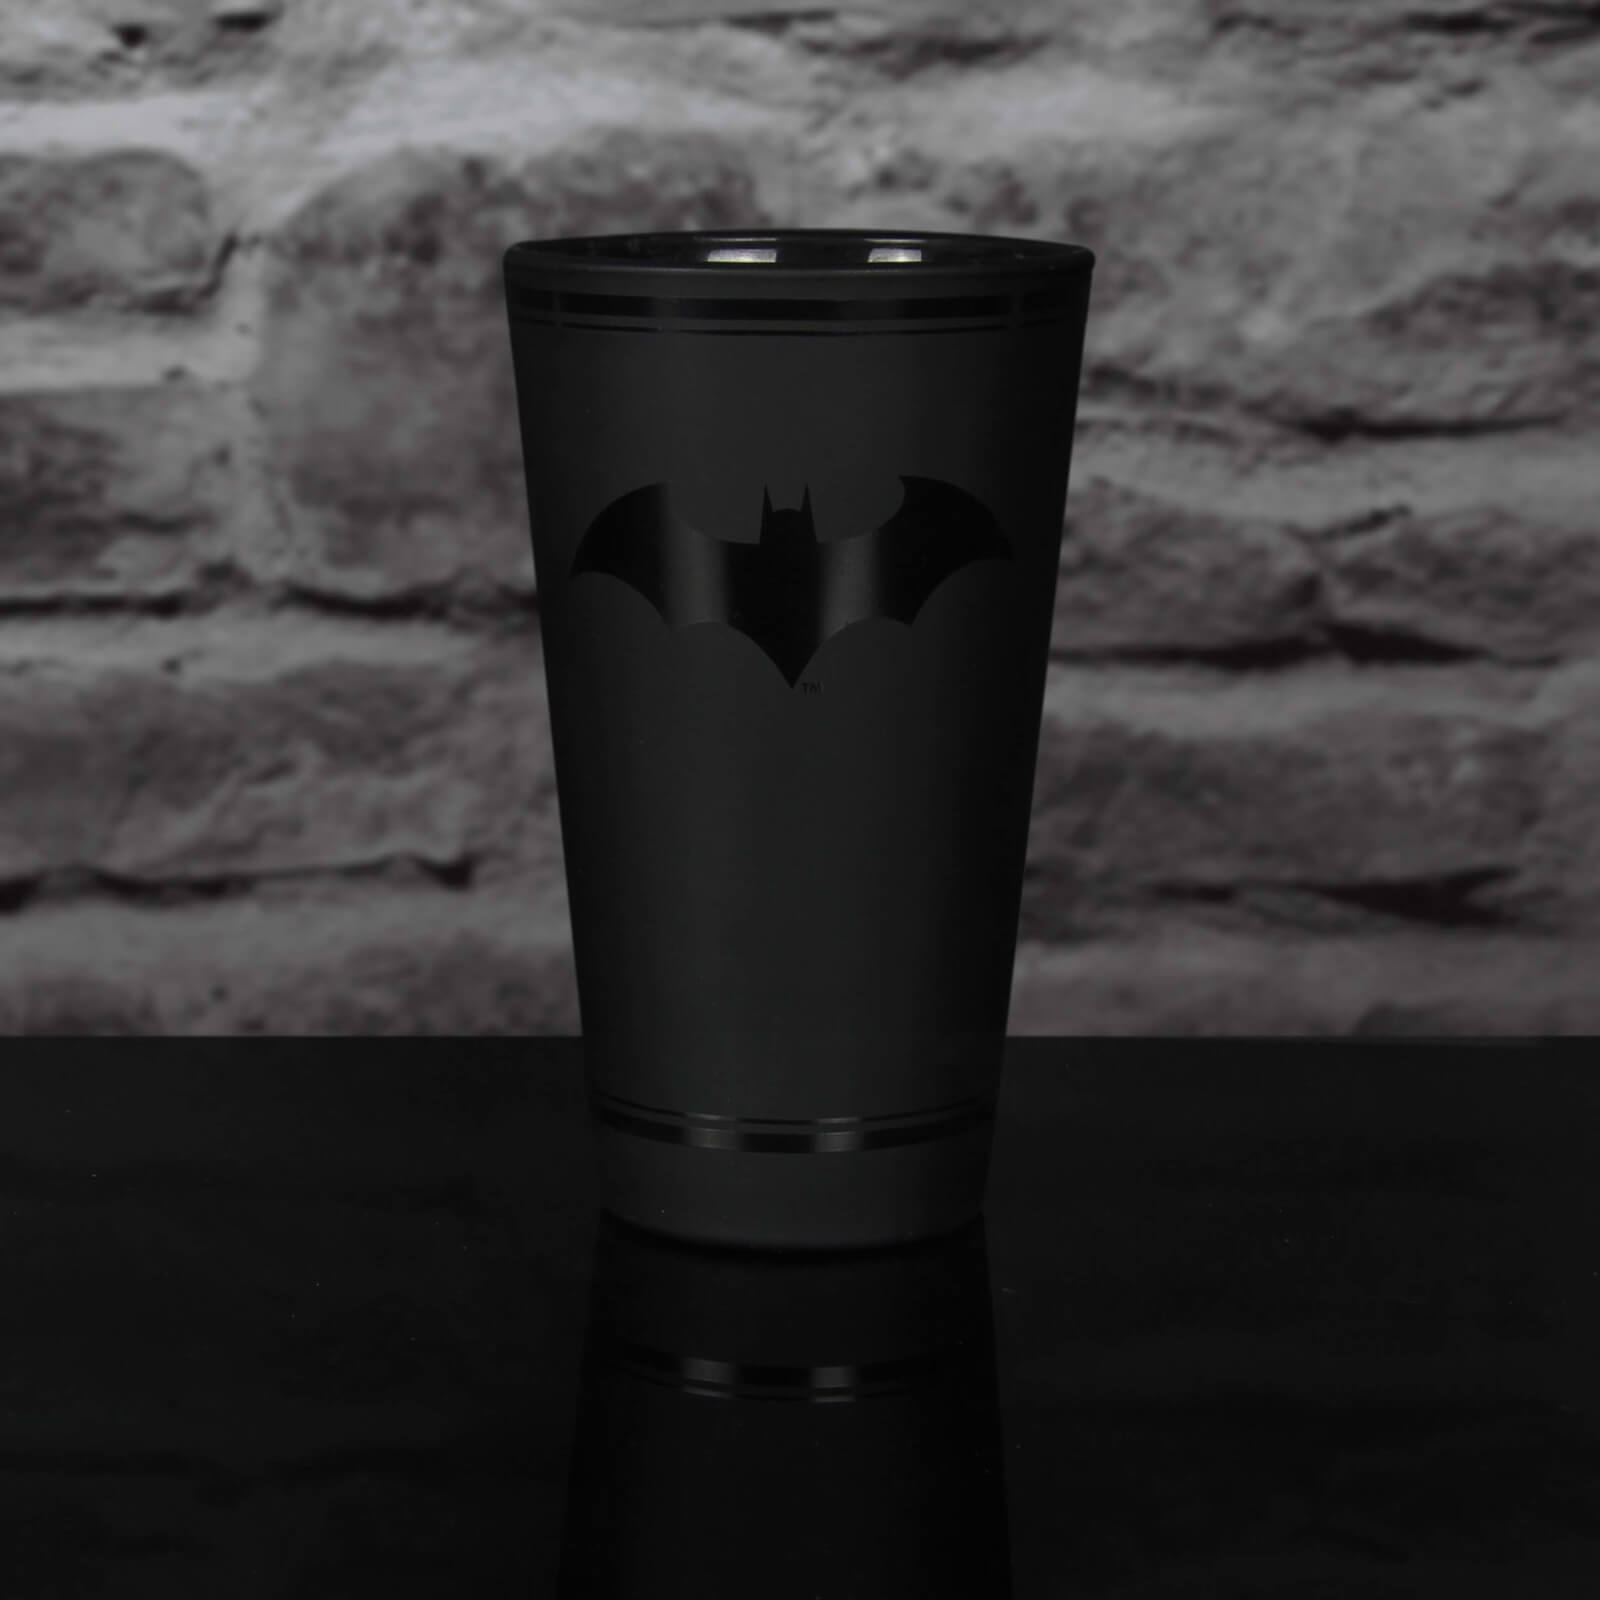 DC Comics: Batman - Tumbler Glass (400ml) image